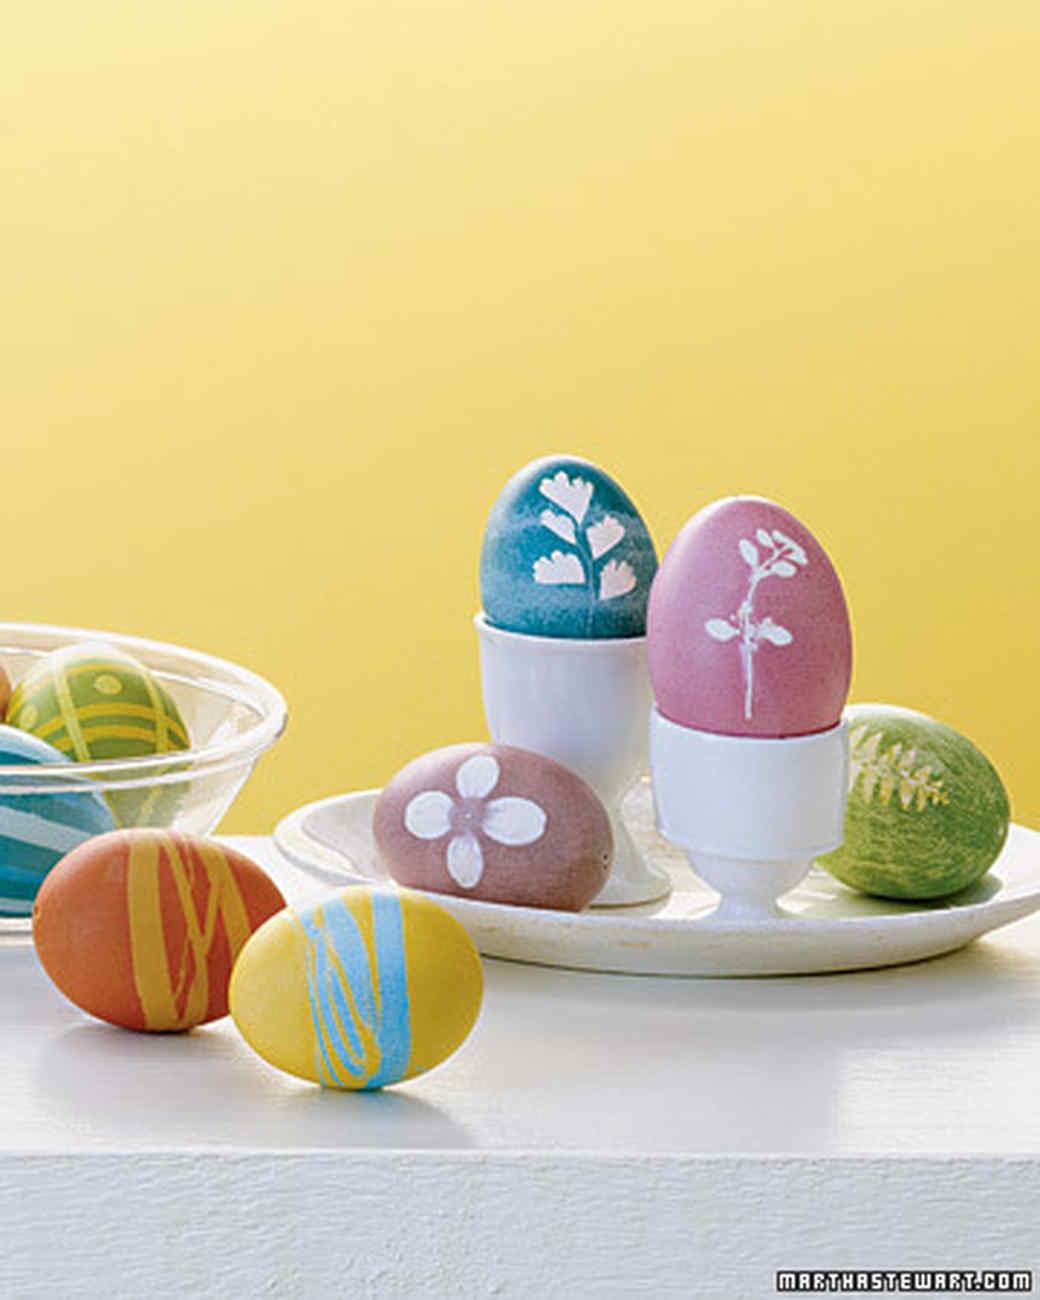 mla101222_0305_tape_eggs.jpg